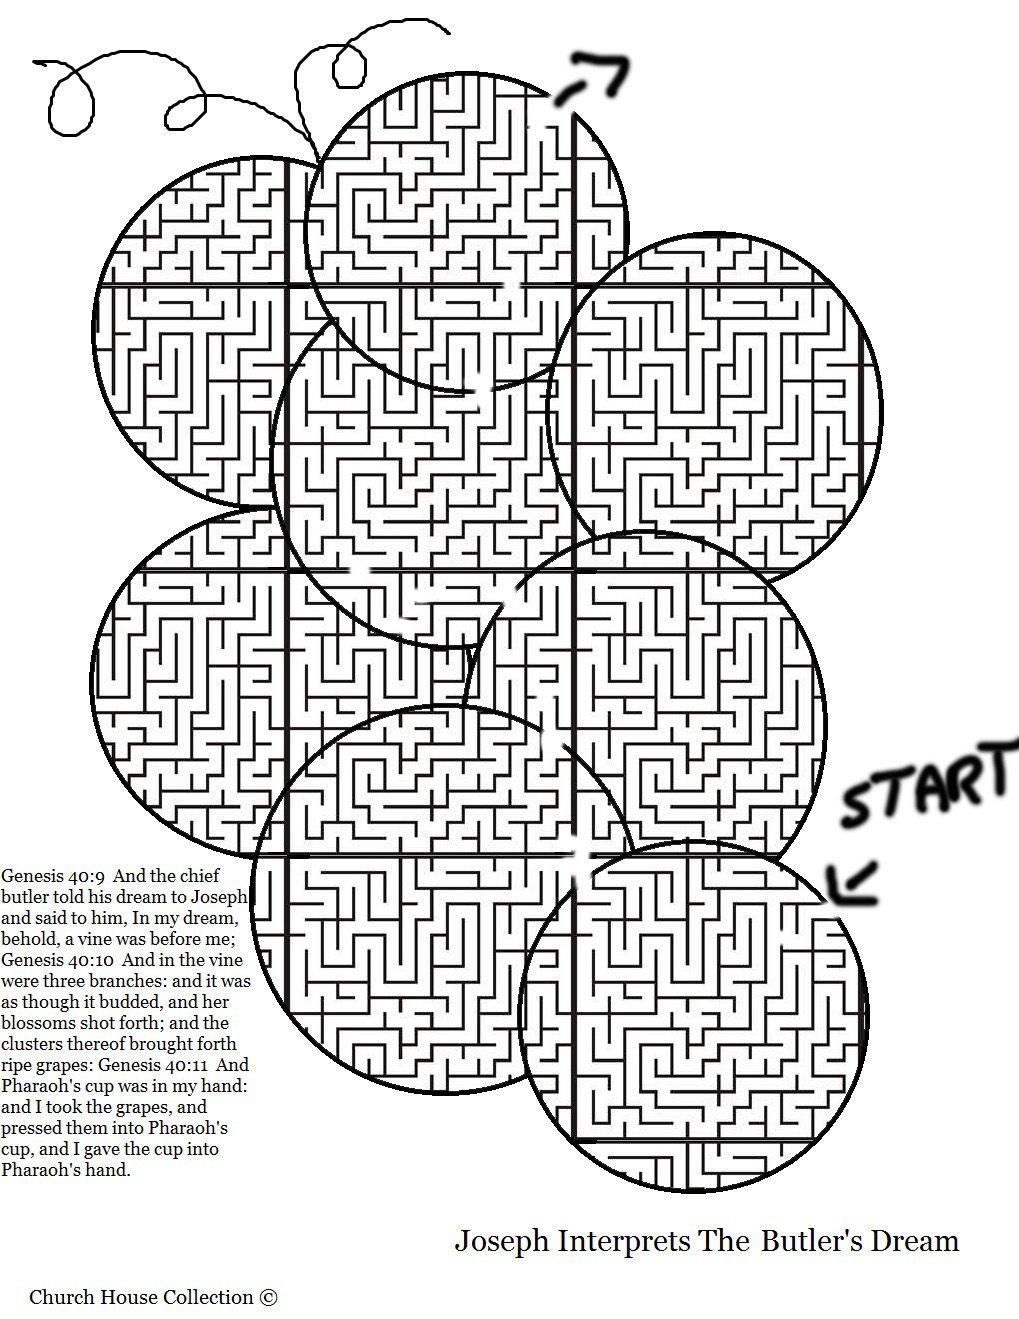 Joseph Interprets The Butler's Dream Maze- Grape Maze